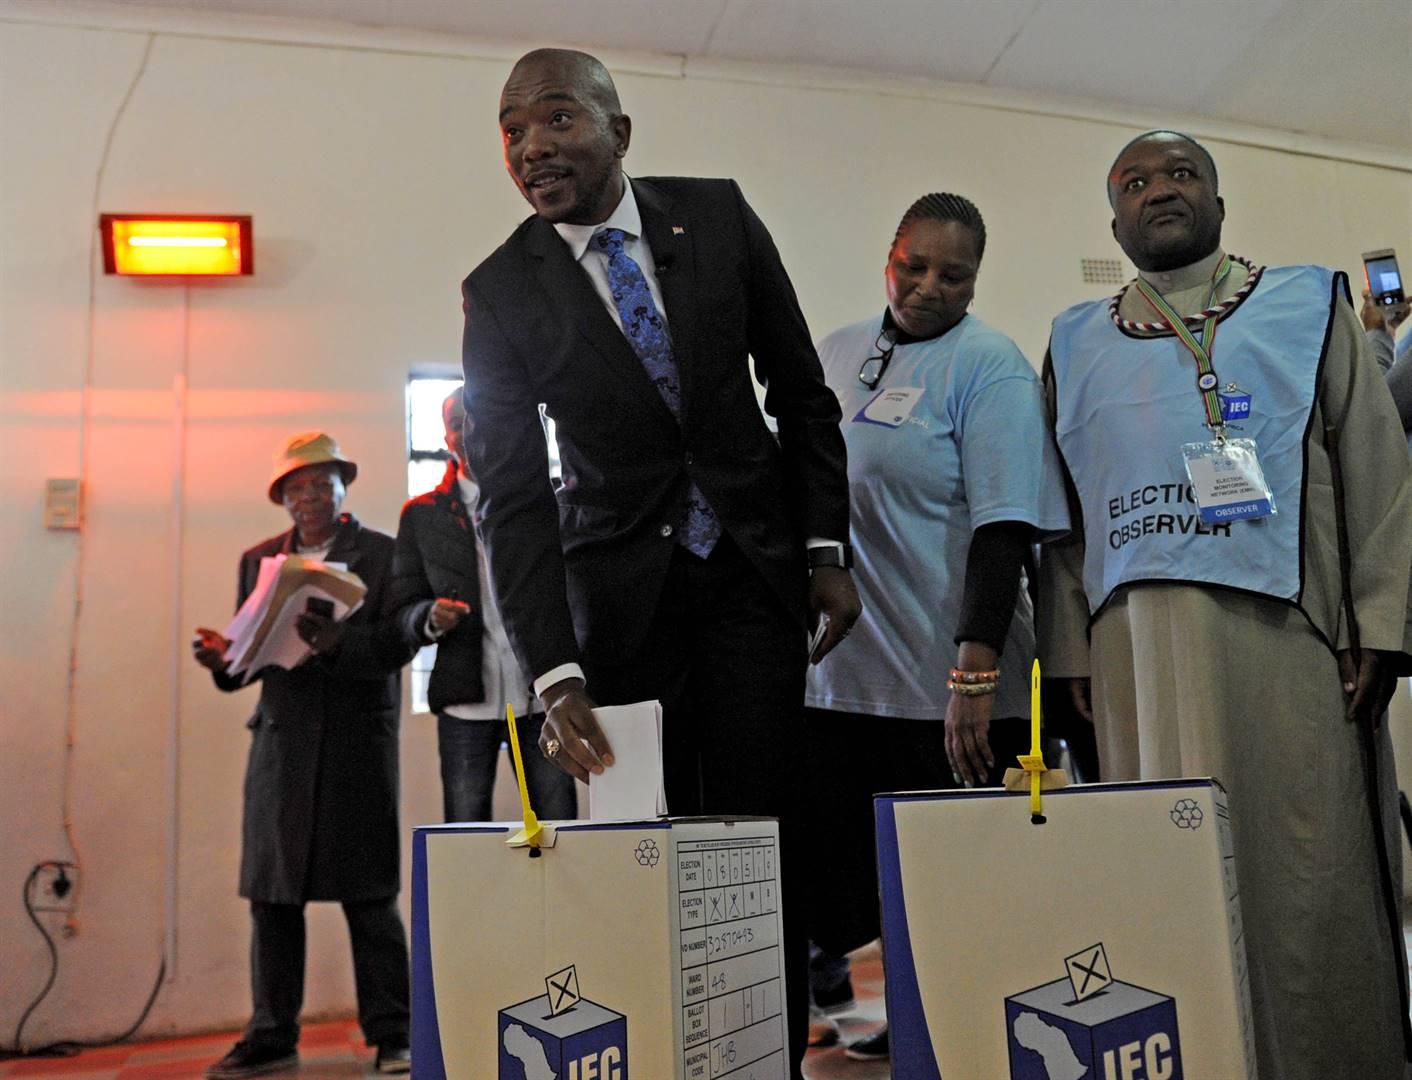 DA leader Mmusi Maimane casts his vote at the Presbyterian church in Dobsonville. Picutre: Tebogo Letsie